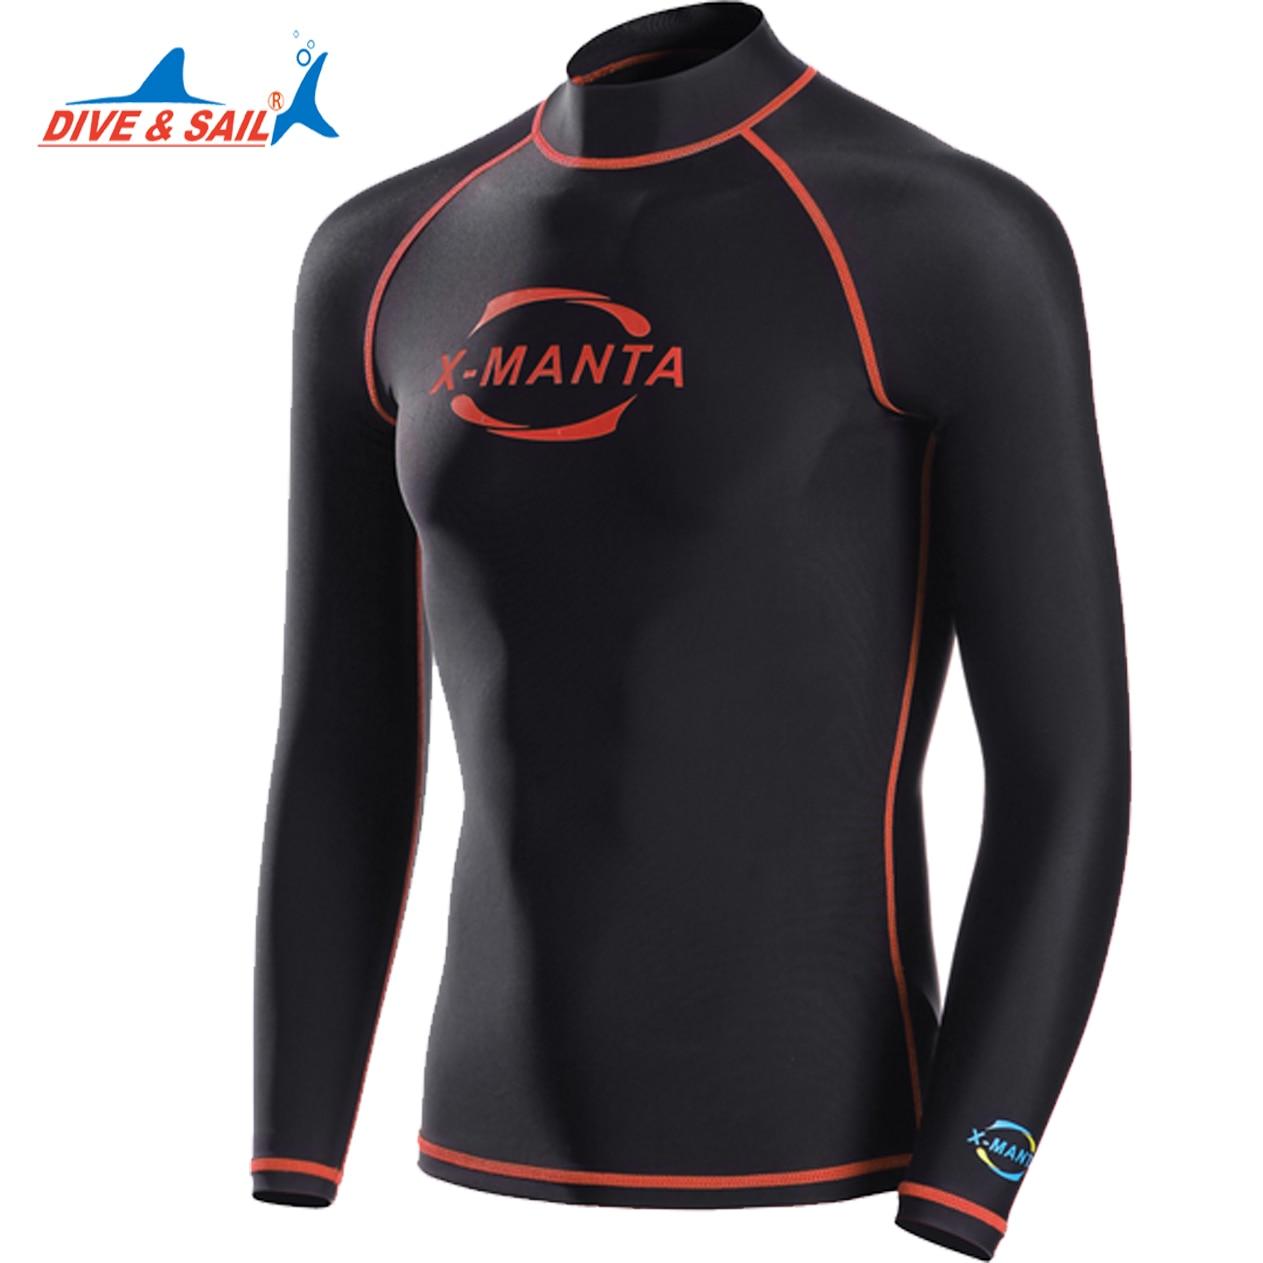 Dive sail lycra upf 50 long sleeve rash guards shirts for for Men s upf long sleeve shirt